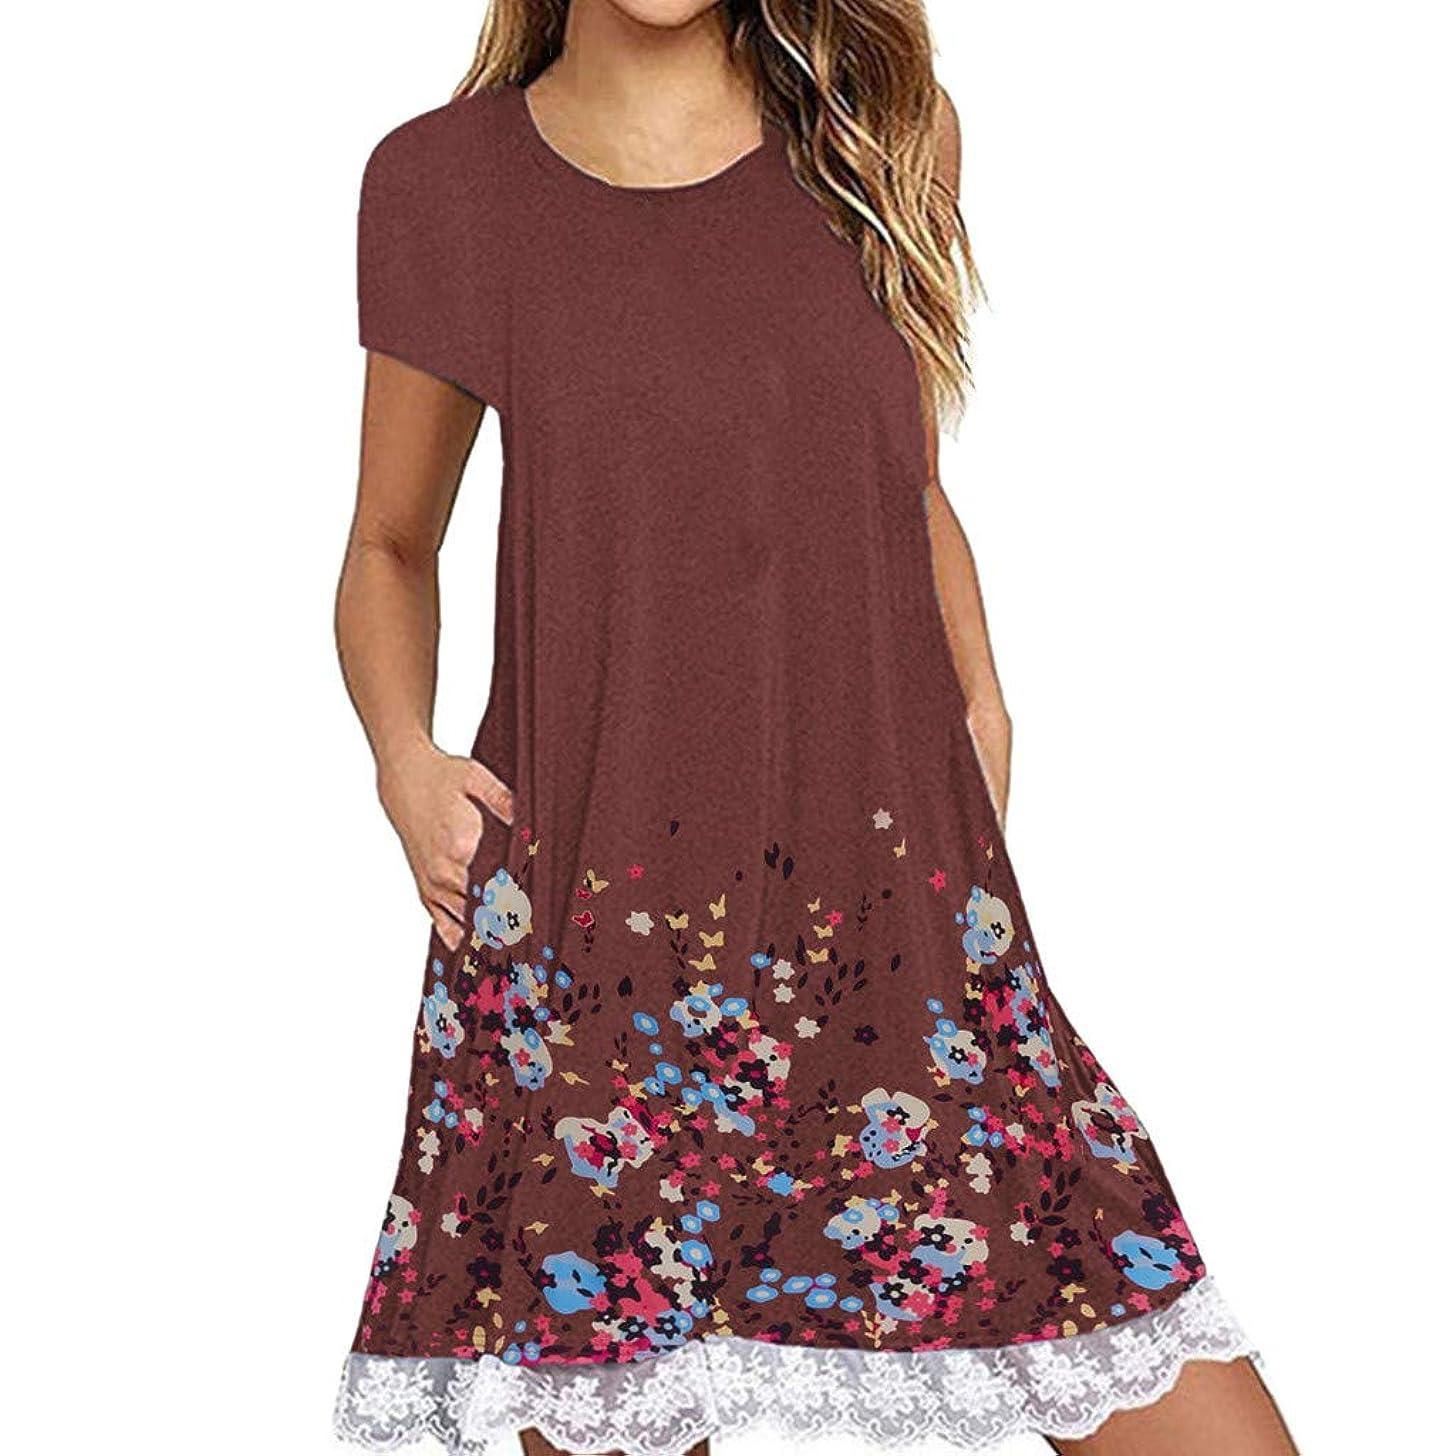 Women Casual Loose T-Shirt Dress Summer Tunic Lace Tank Dress Sleeveless T-Shirt Swing Dress with Pockets Sundress